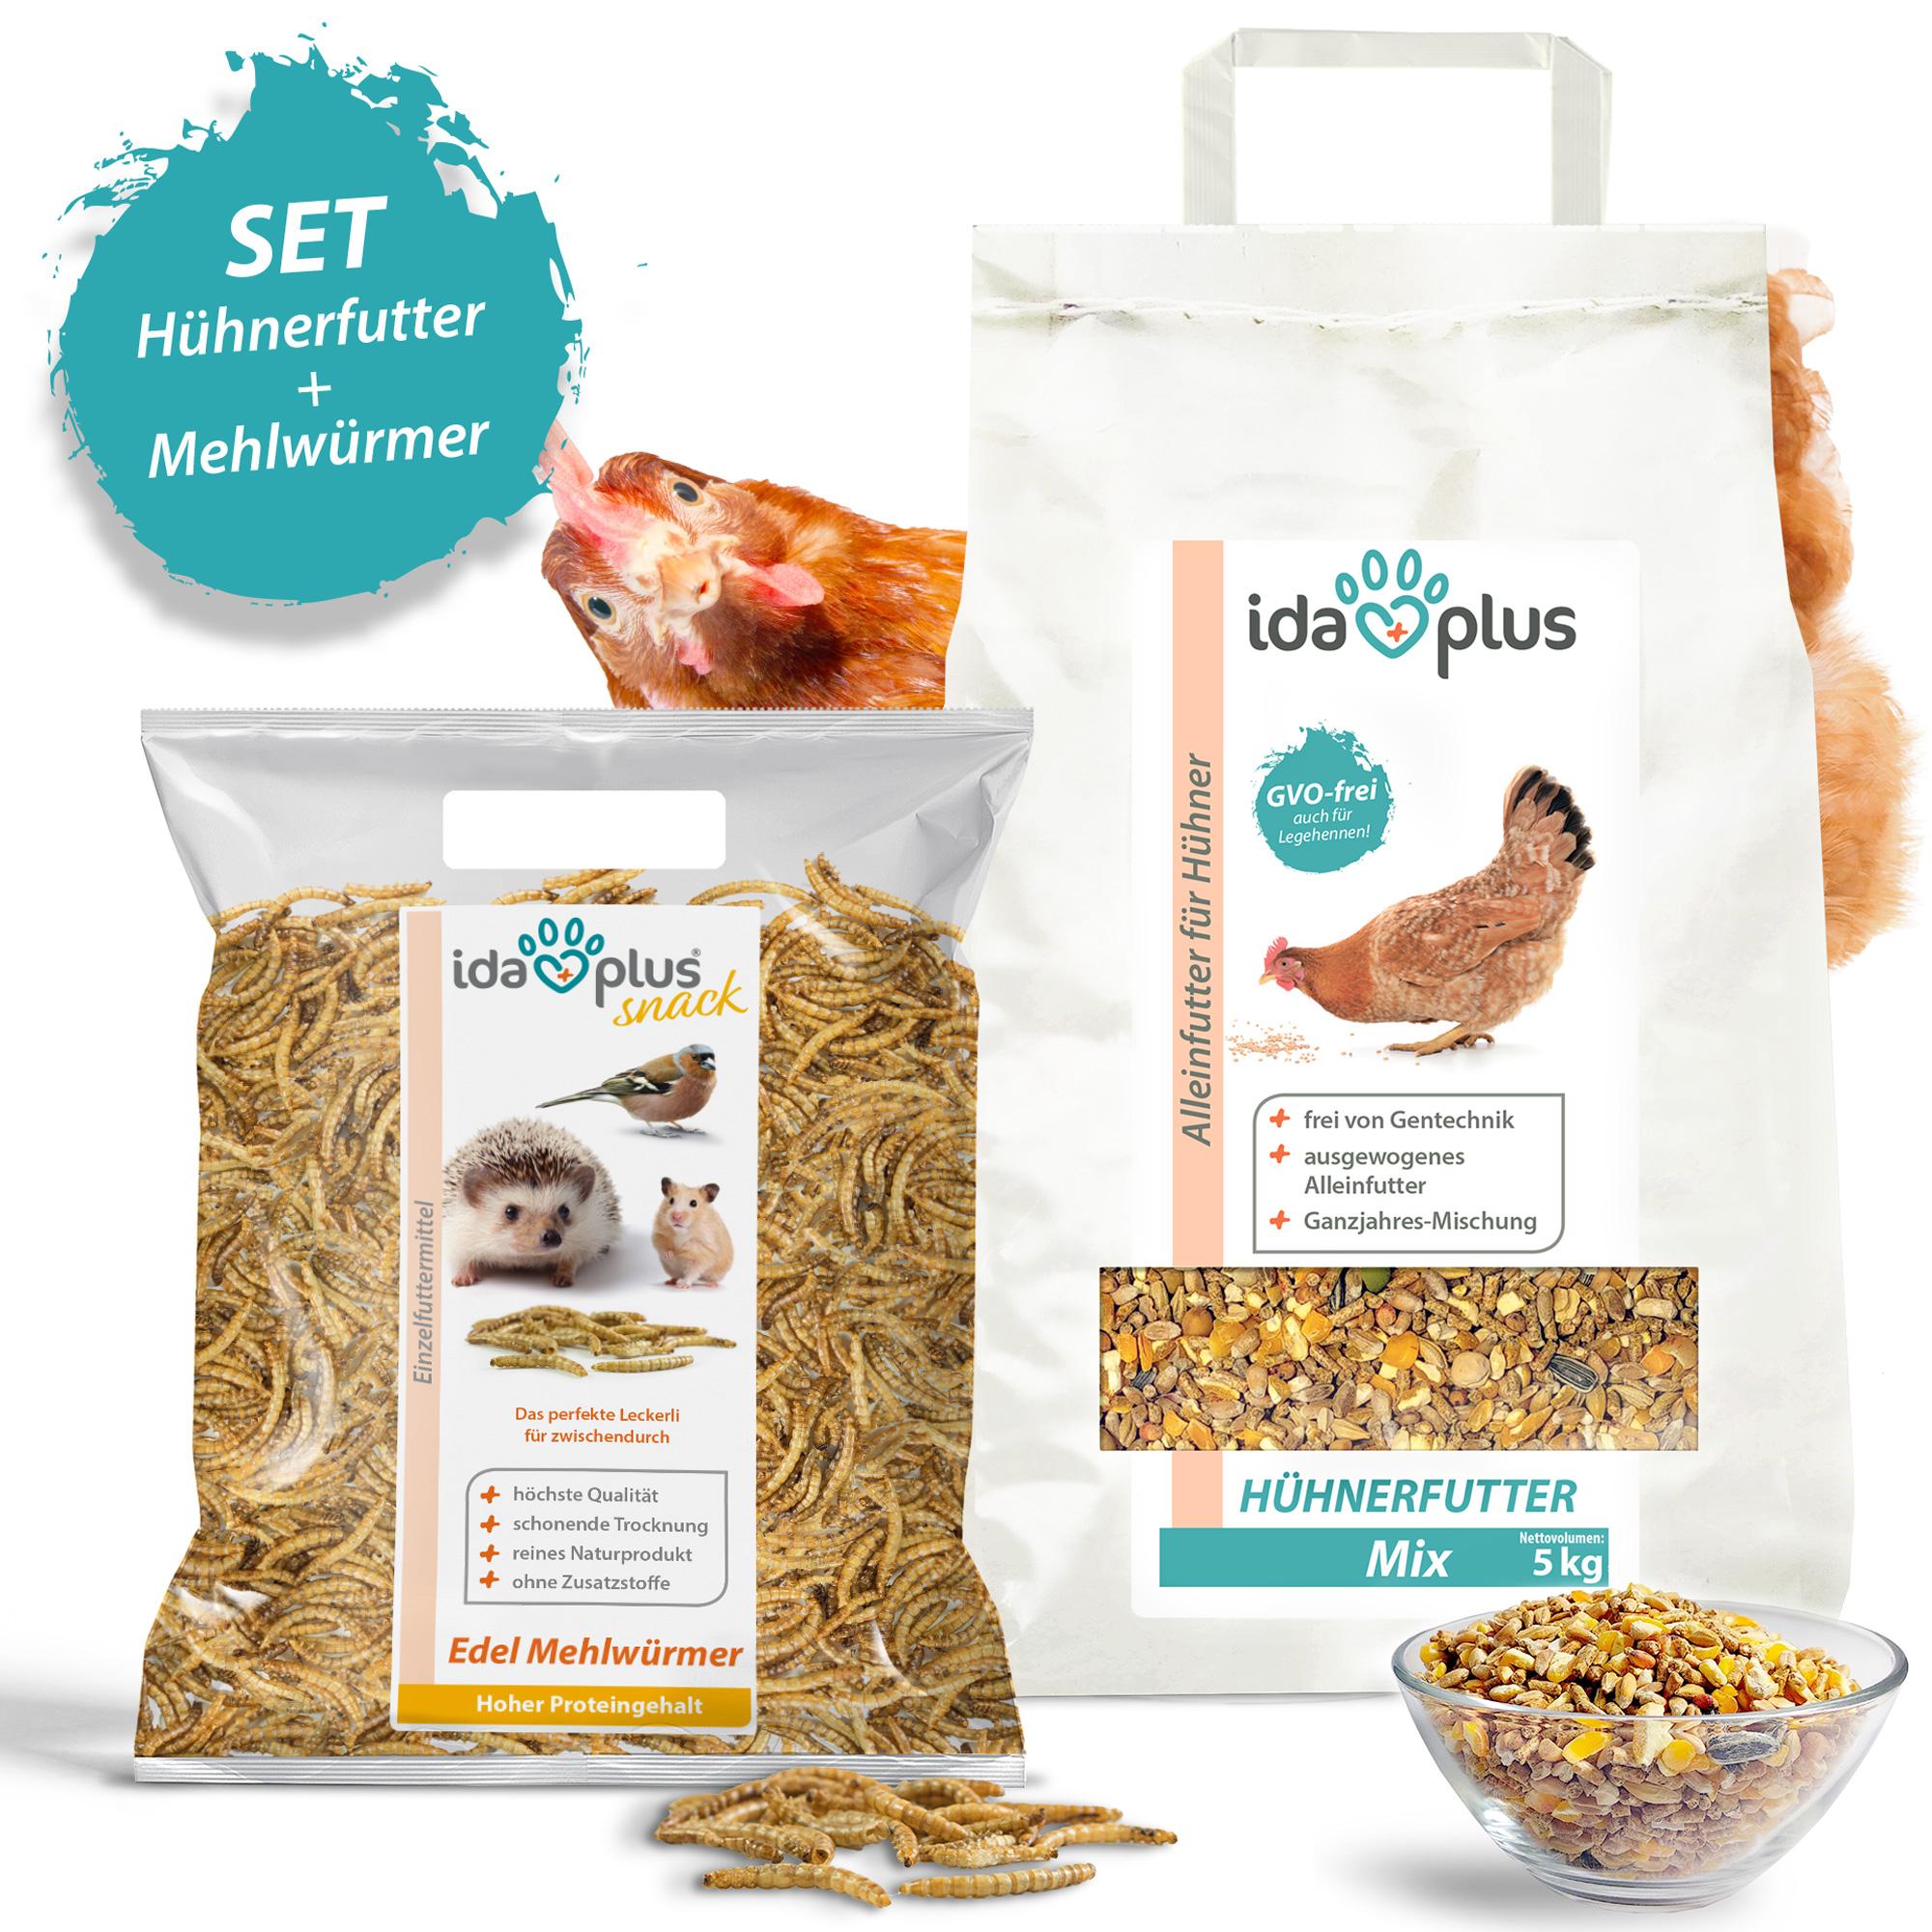 Hühnerfutter + Mehlwürmer - Ausgewogenes Alleinfutter + Edel Mehlwürmer - 5+1 Kg